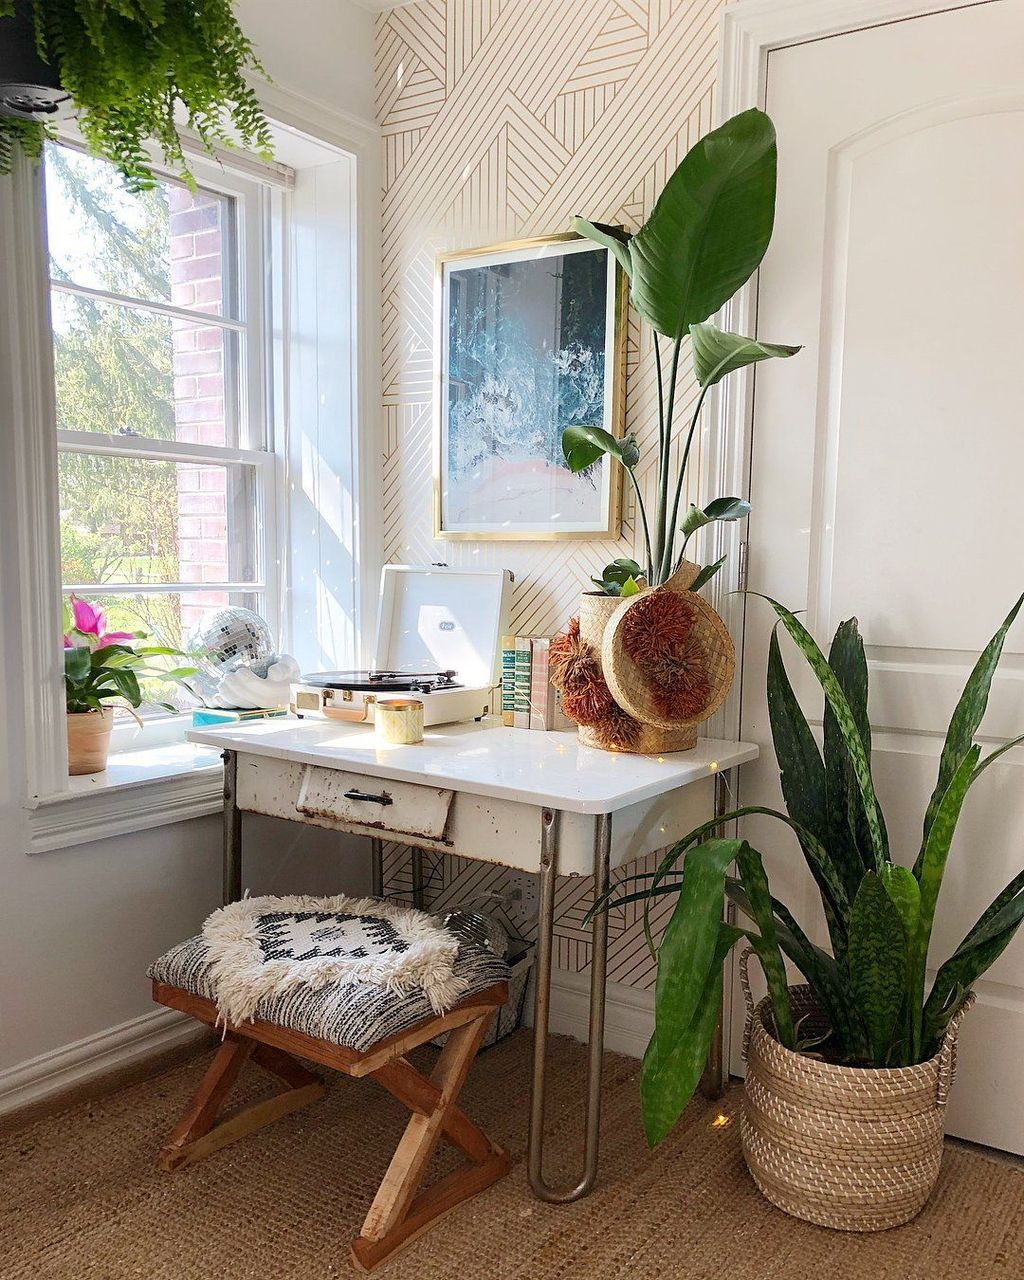 Inspiring Modern Home Furnishings Design Ideas 30